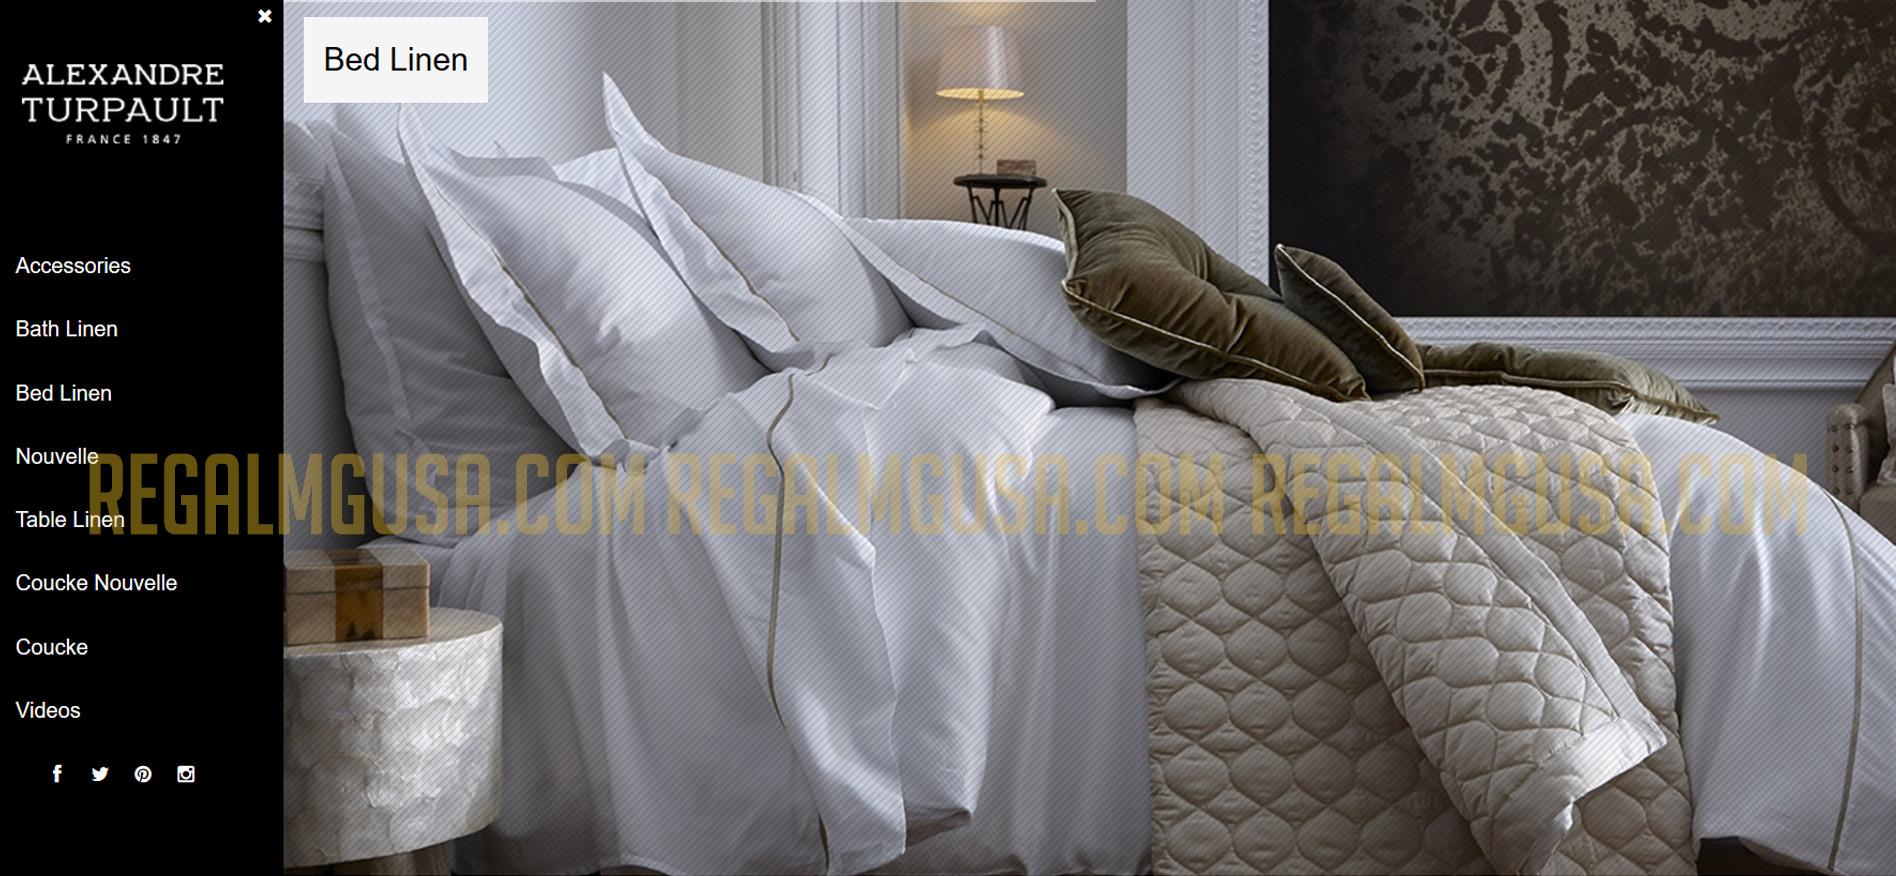 Alexandre Turpault Regal MG Ecommerce Website Screenshot